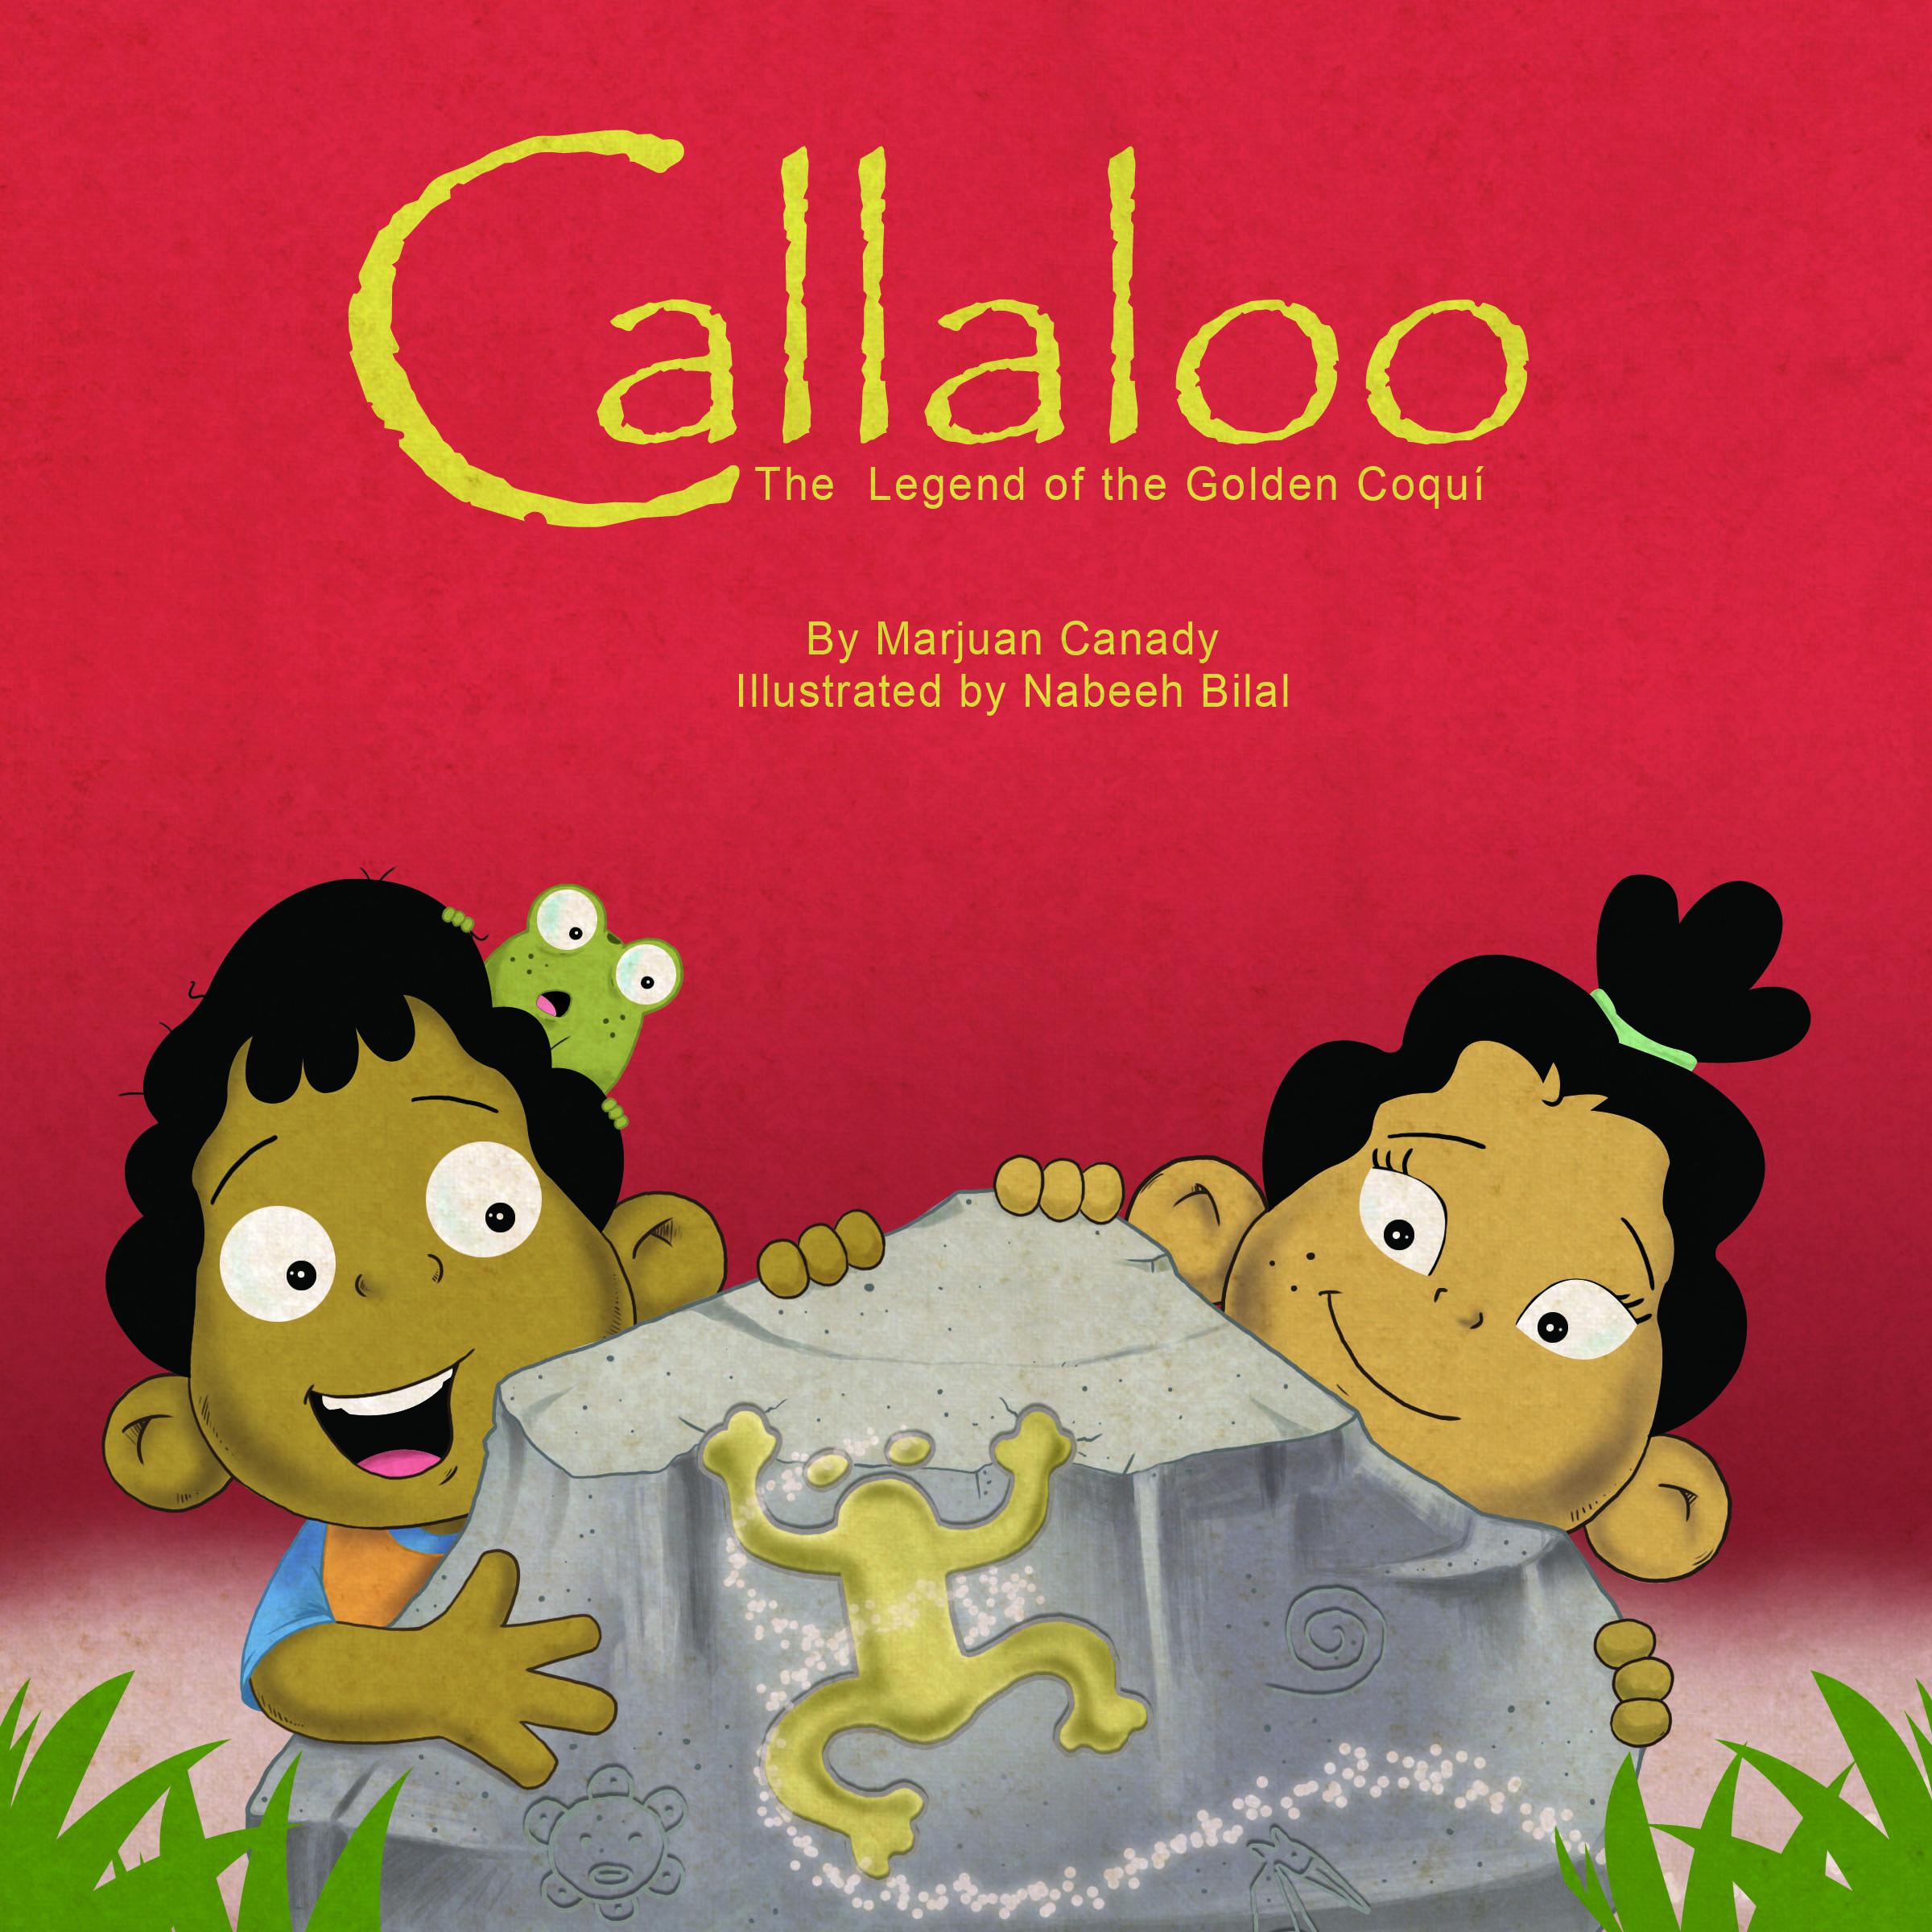 Callaloo2_cover-Final (1).jpg